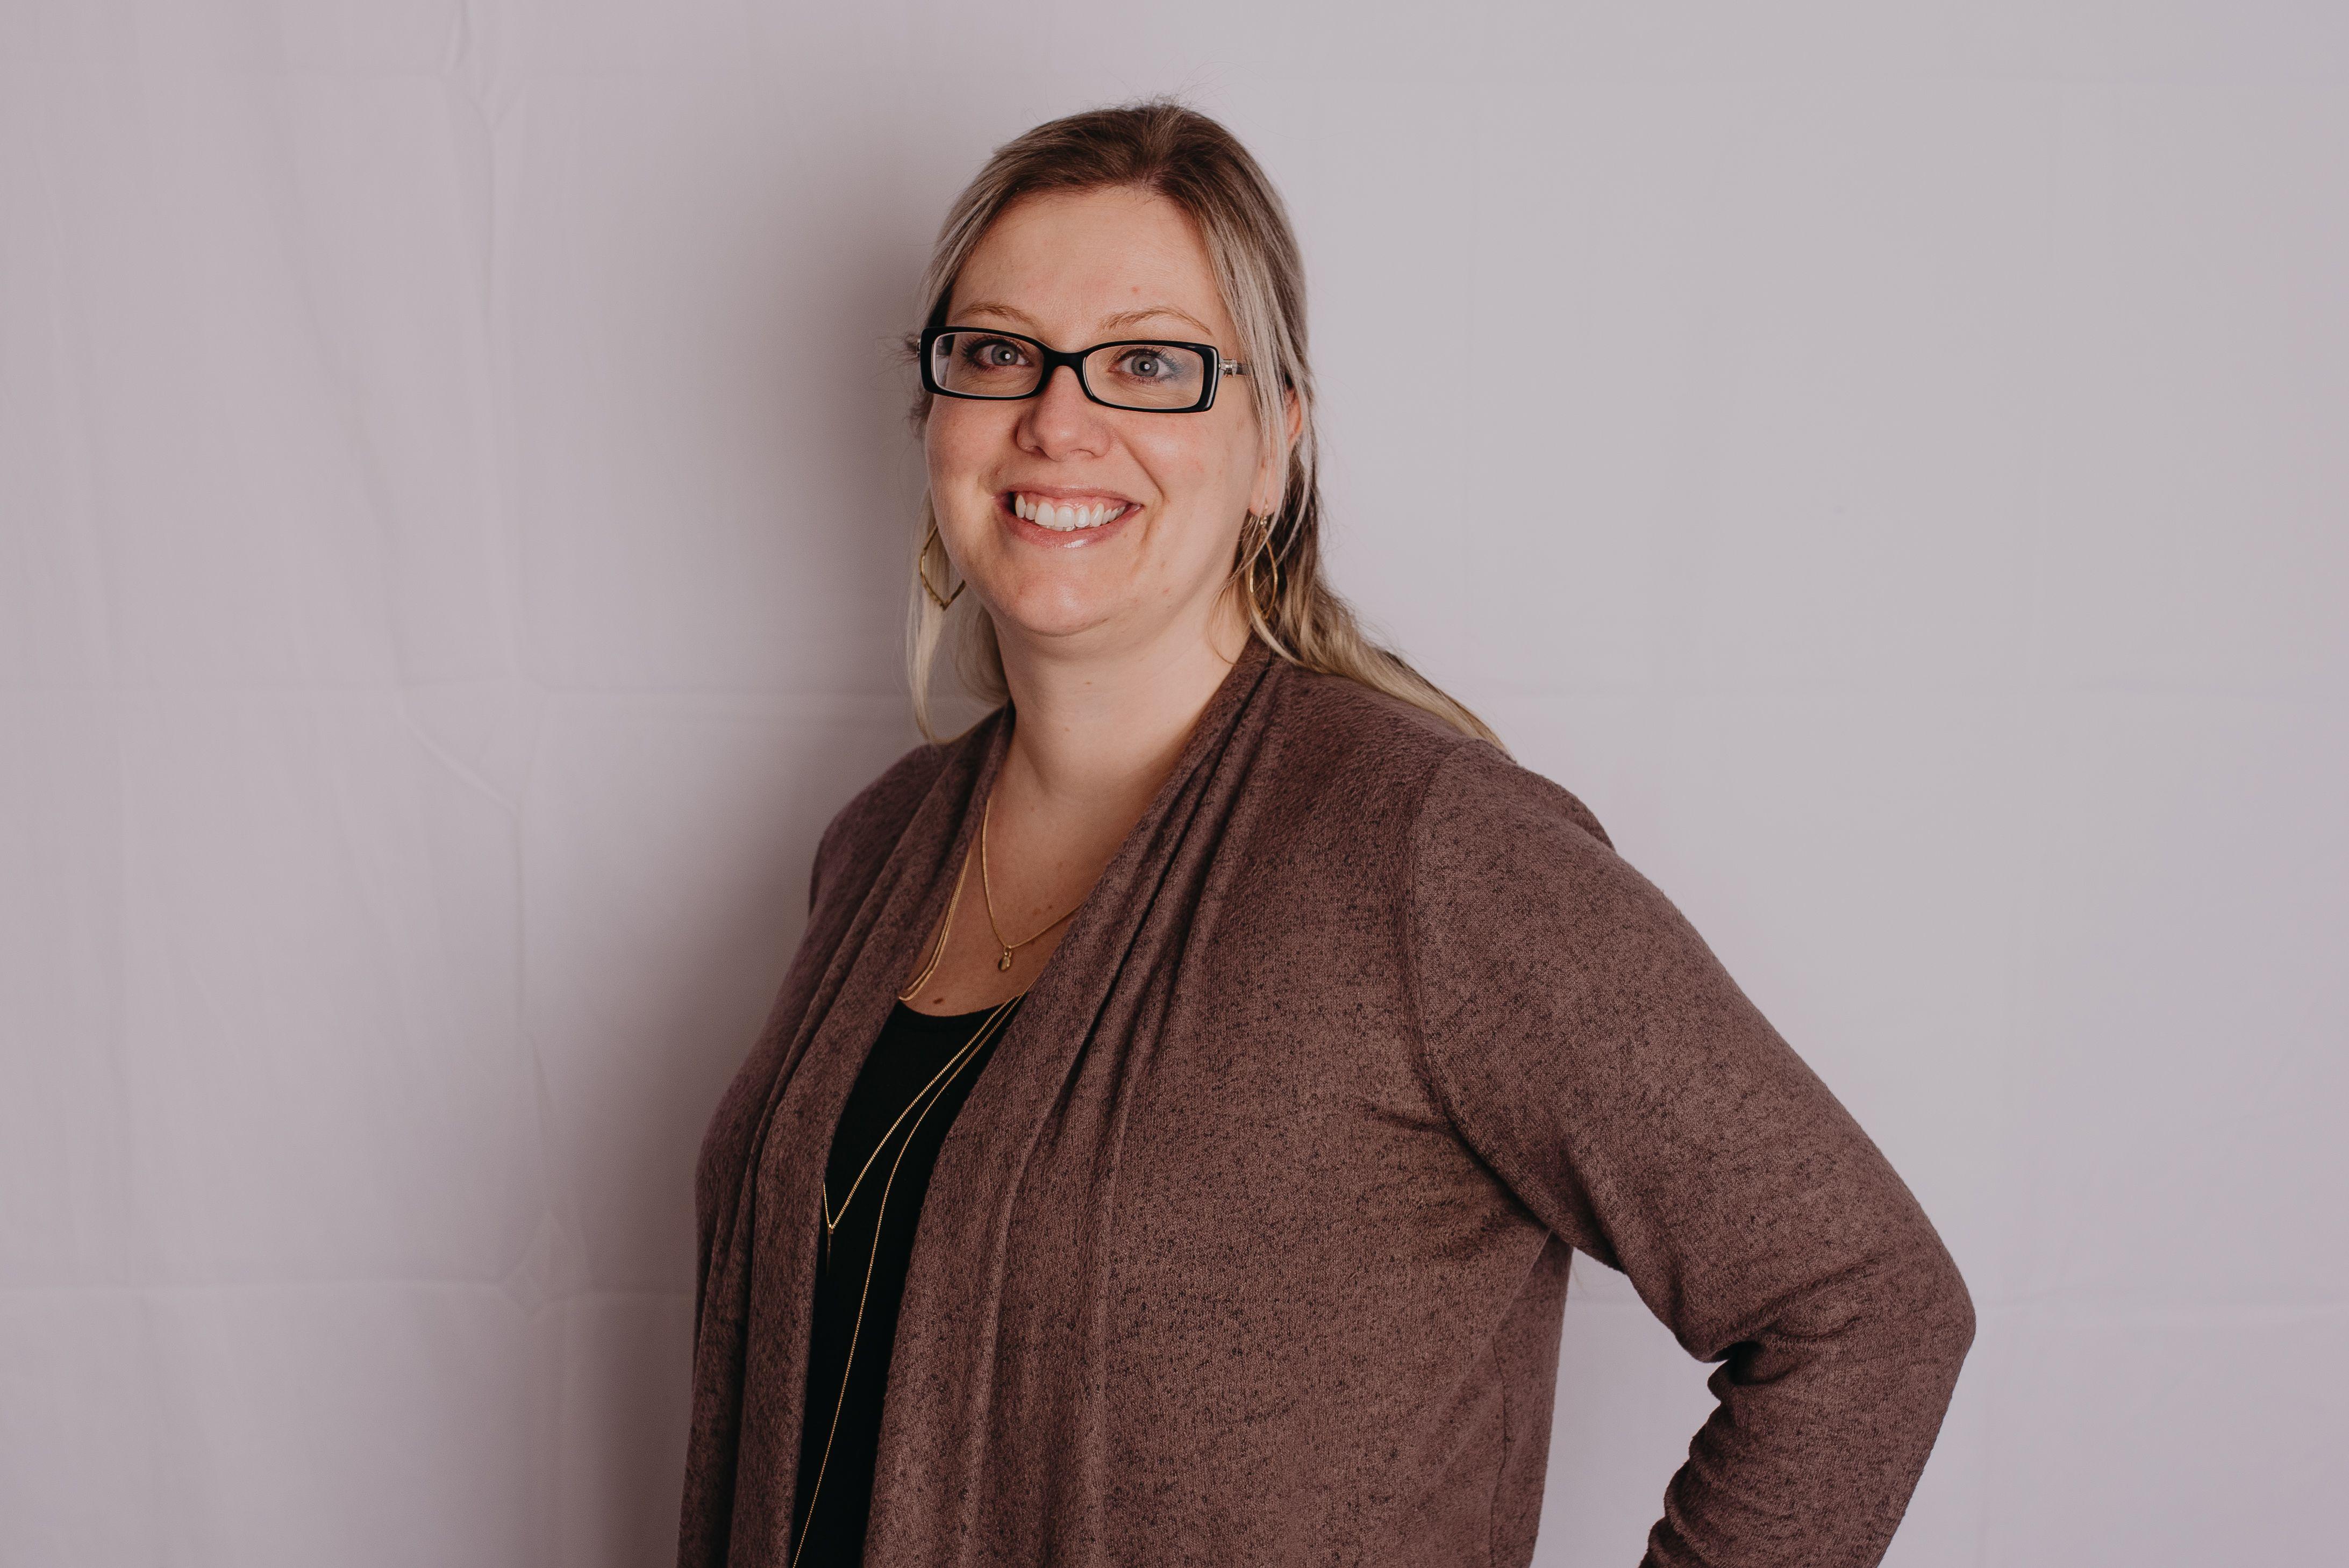 Nicole Skinner, Vice Chair for External Affairs, Nebraska Medicine